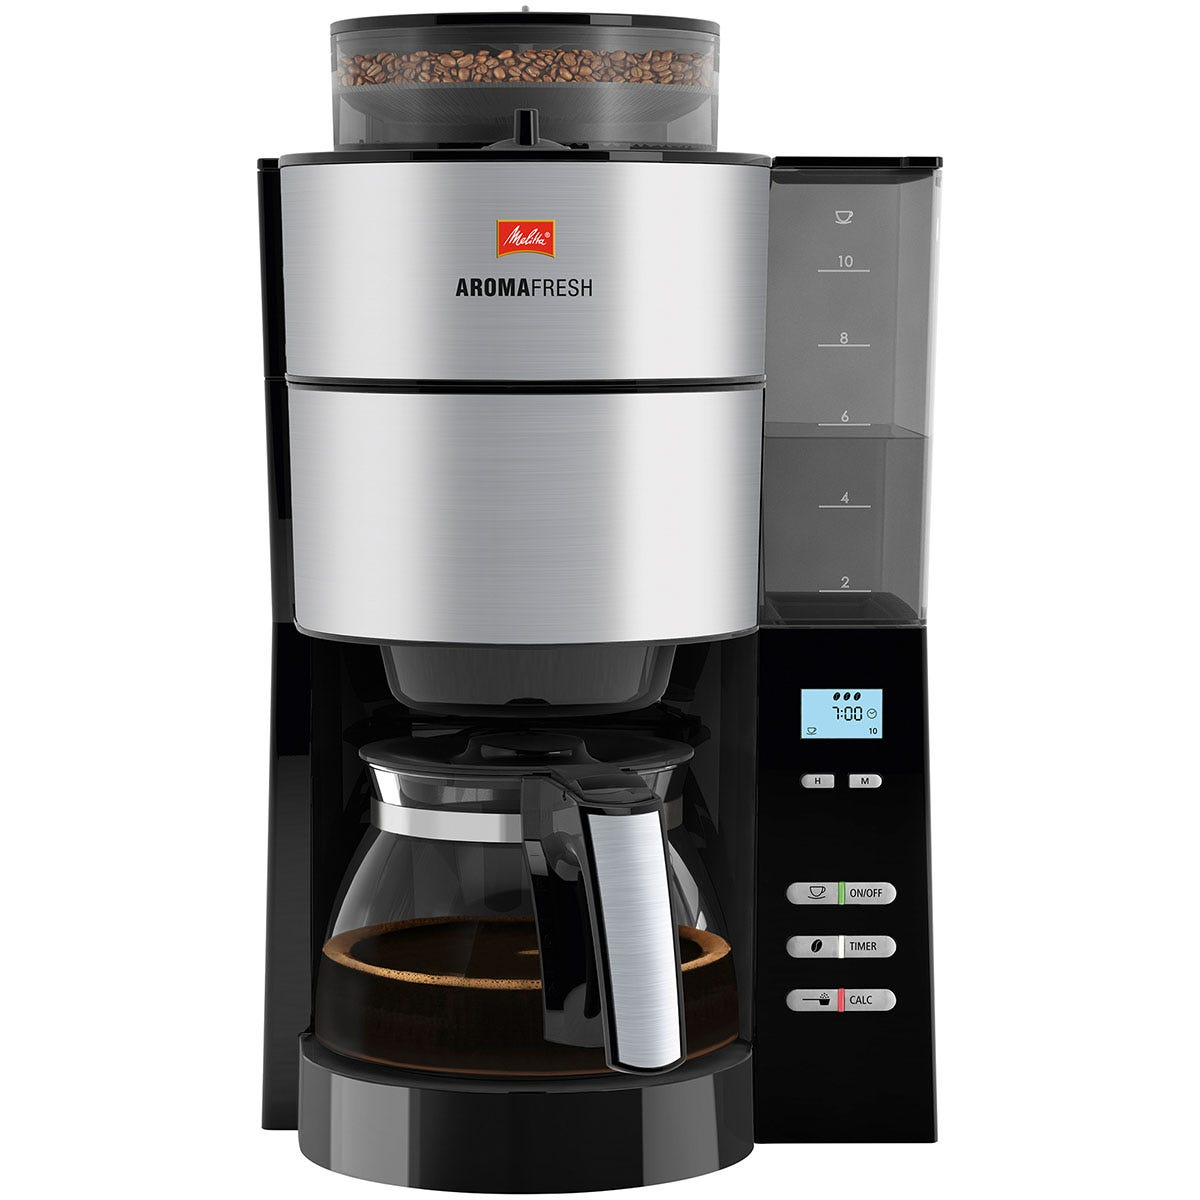 Melitta ML0642 AromaFresh 1.25L Filter Coffee Machine - Silver/Black